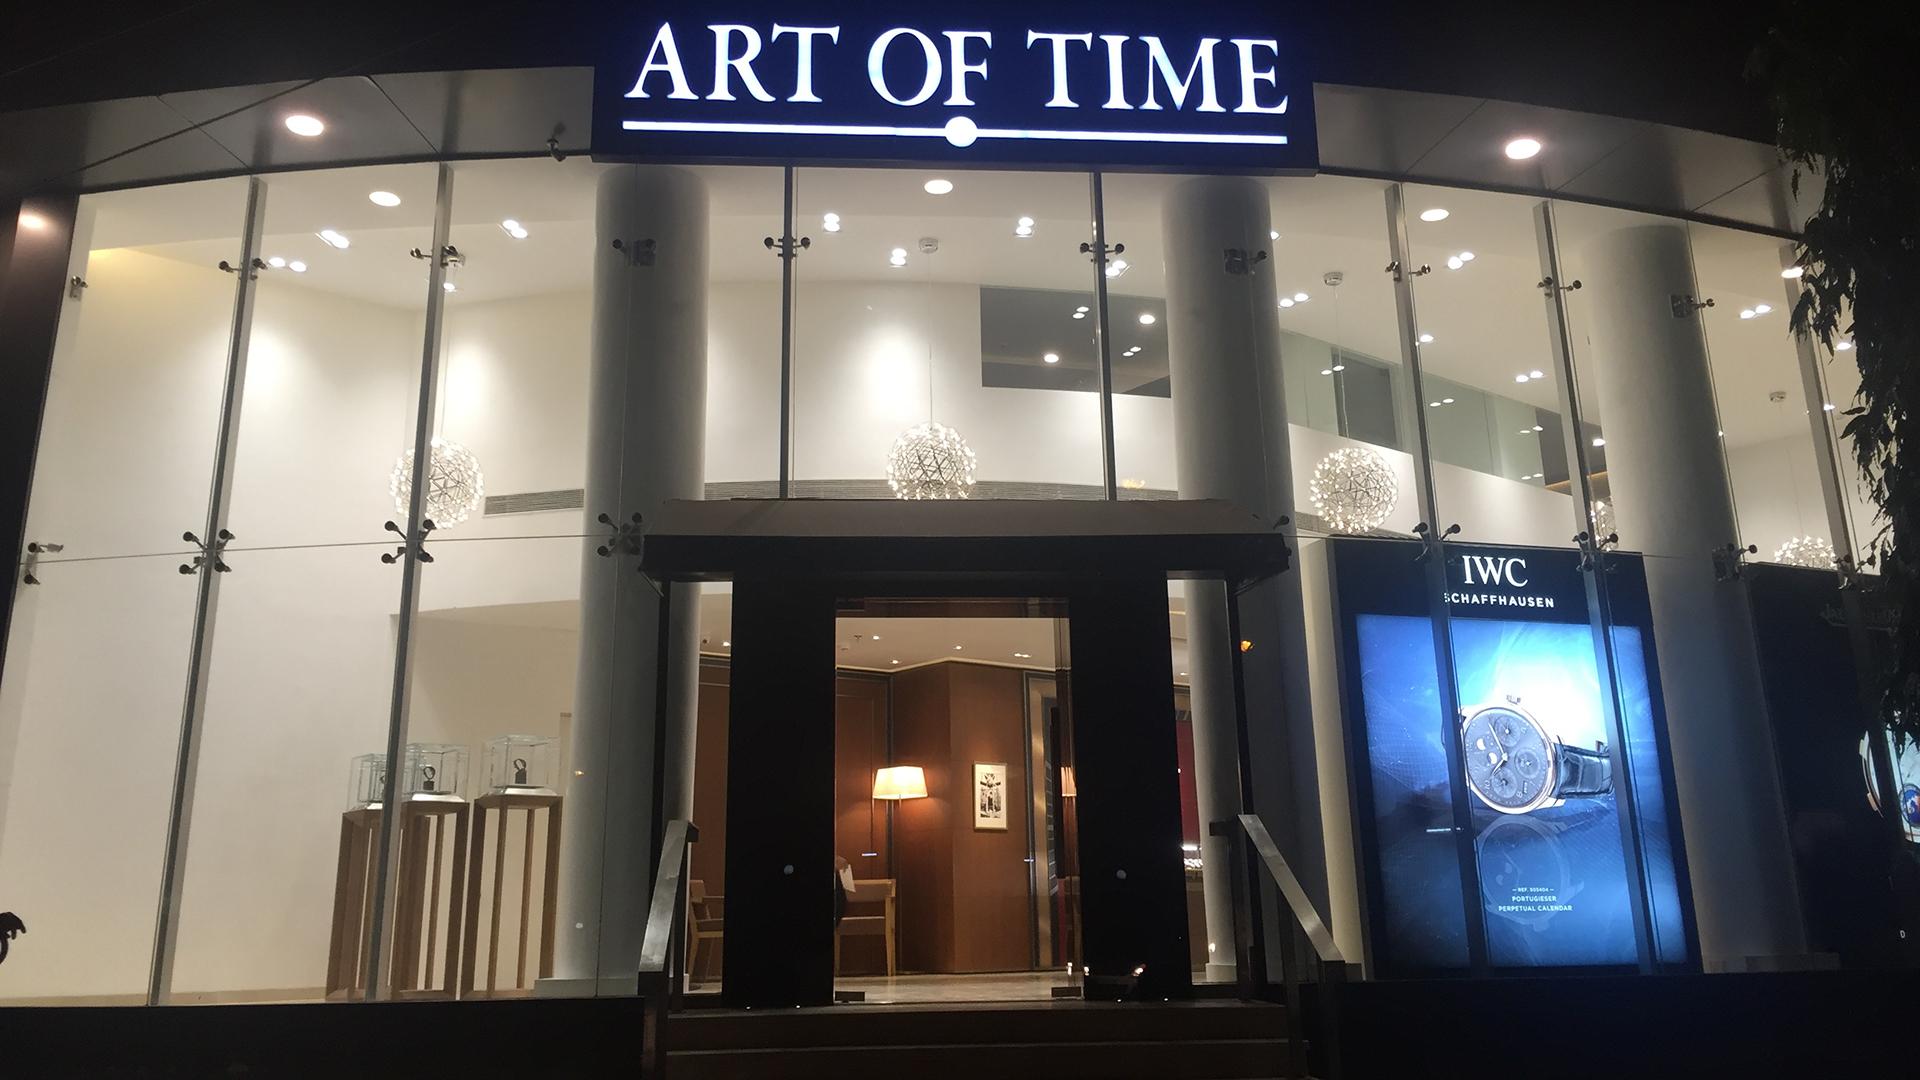 Art of time Store Mumbai